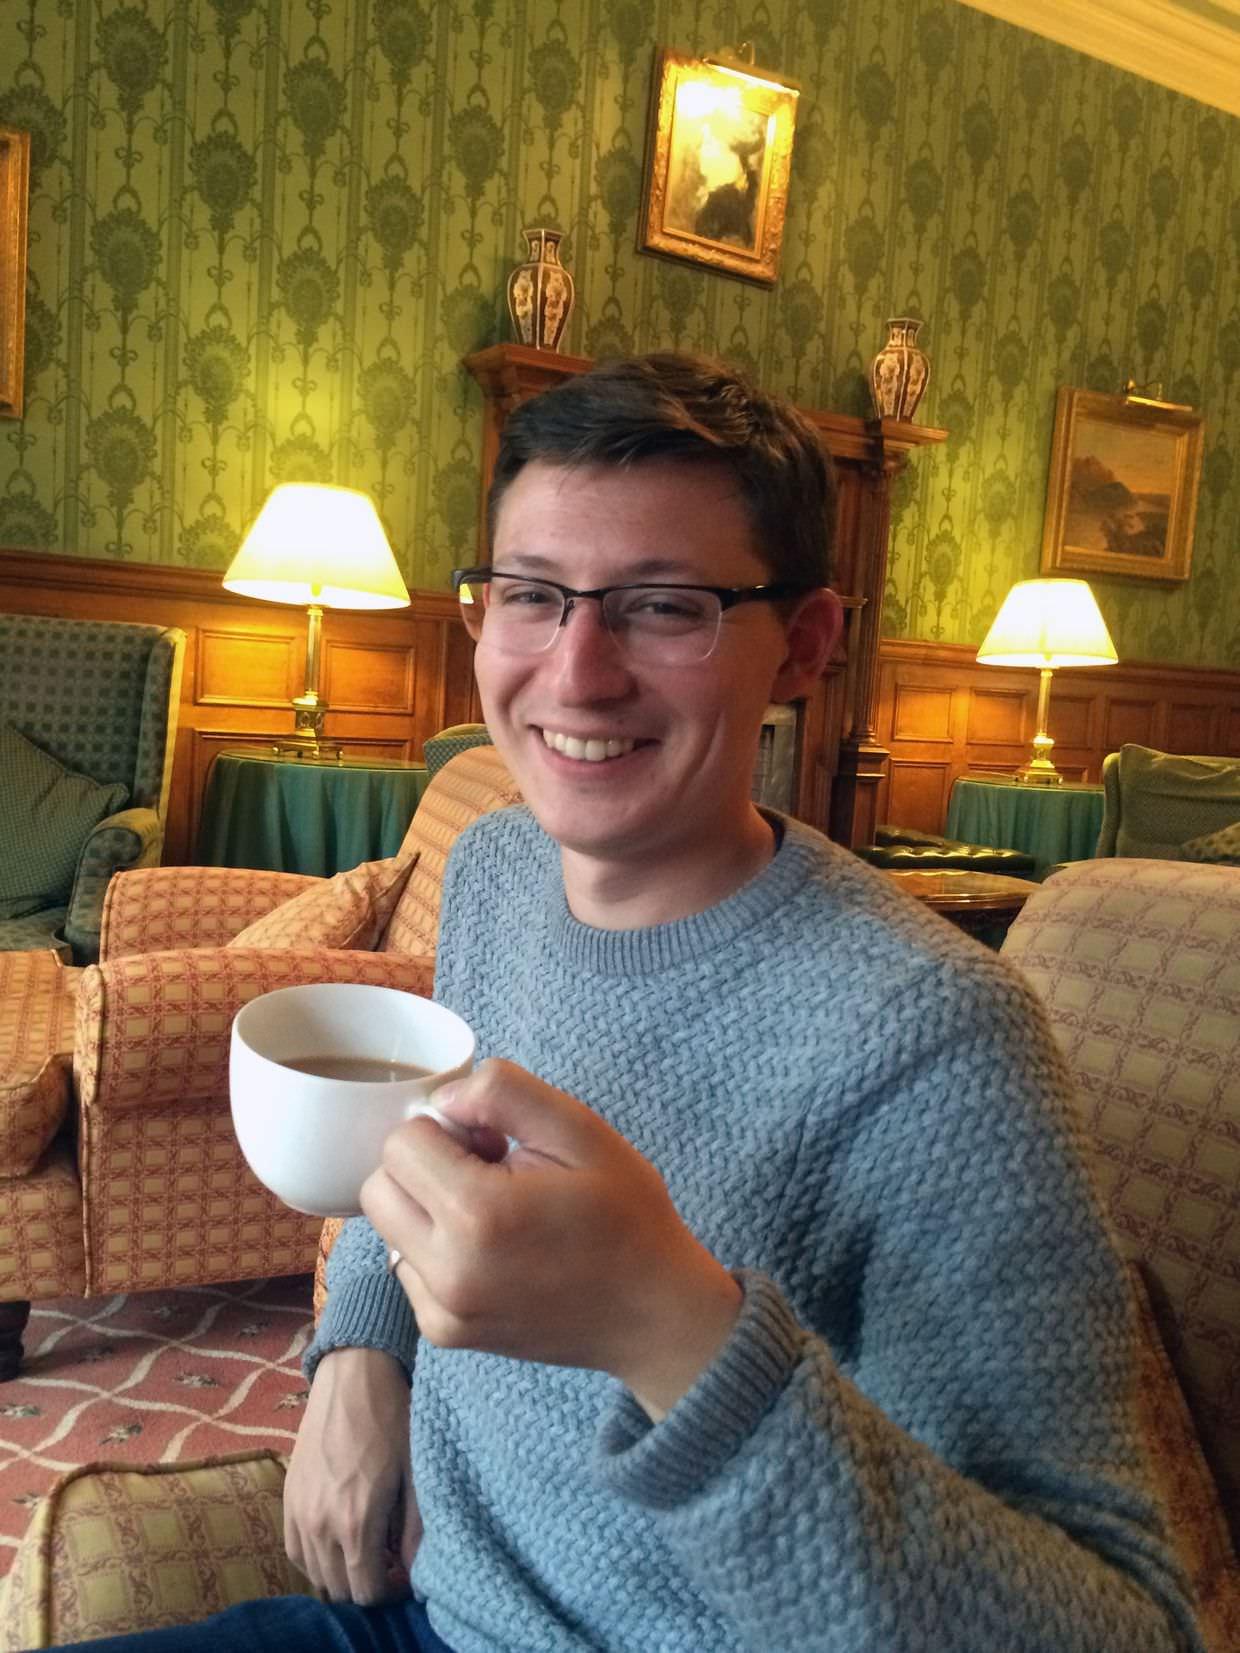 Paul enjoying tea at Kirroughtree